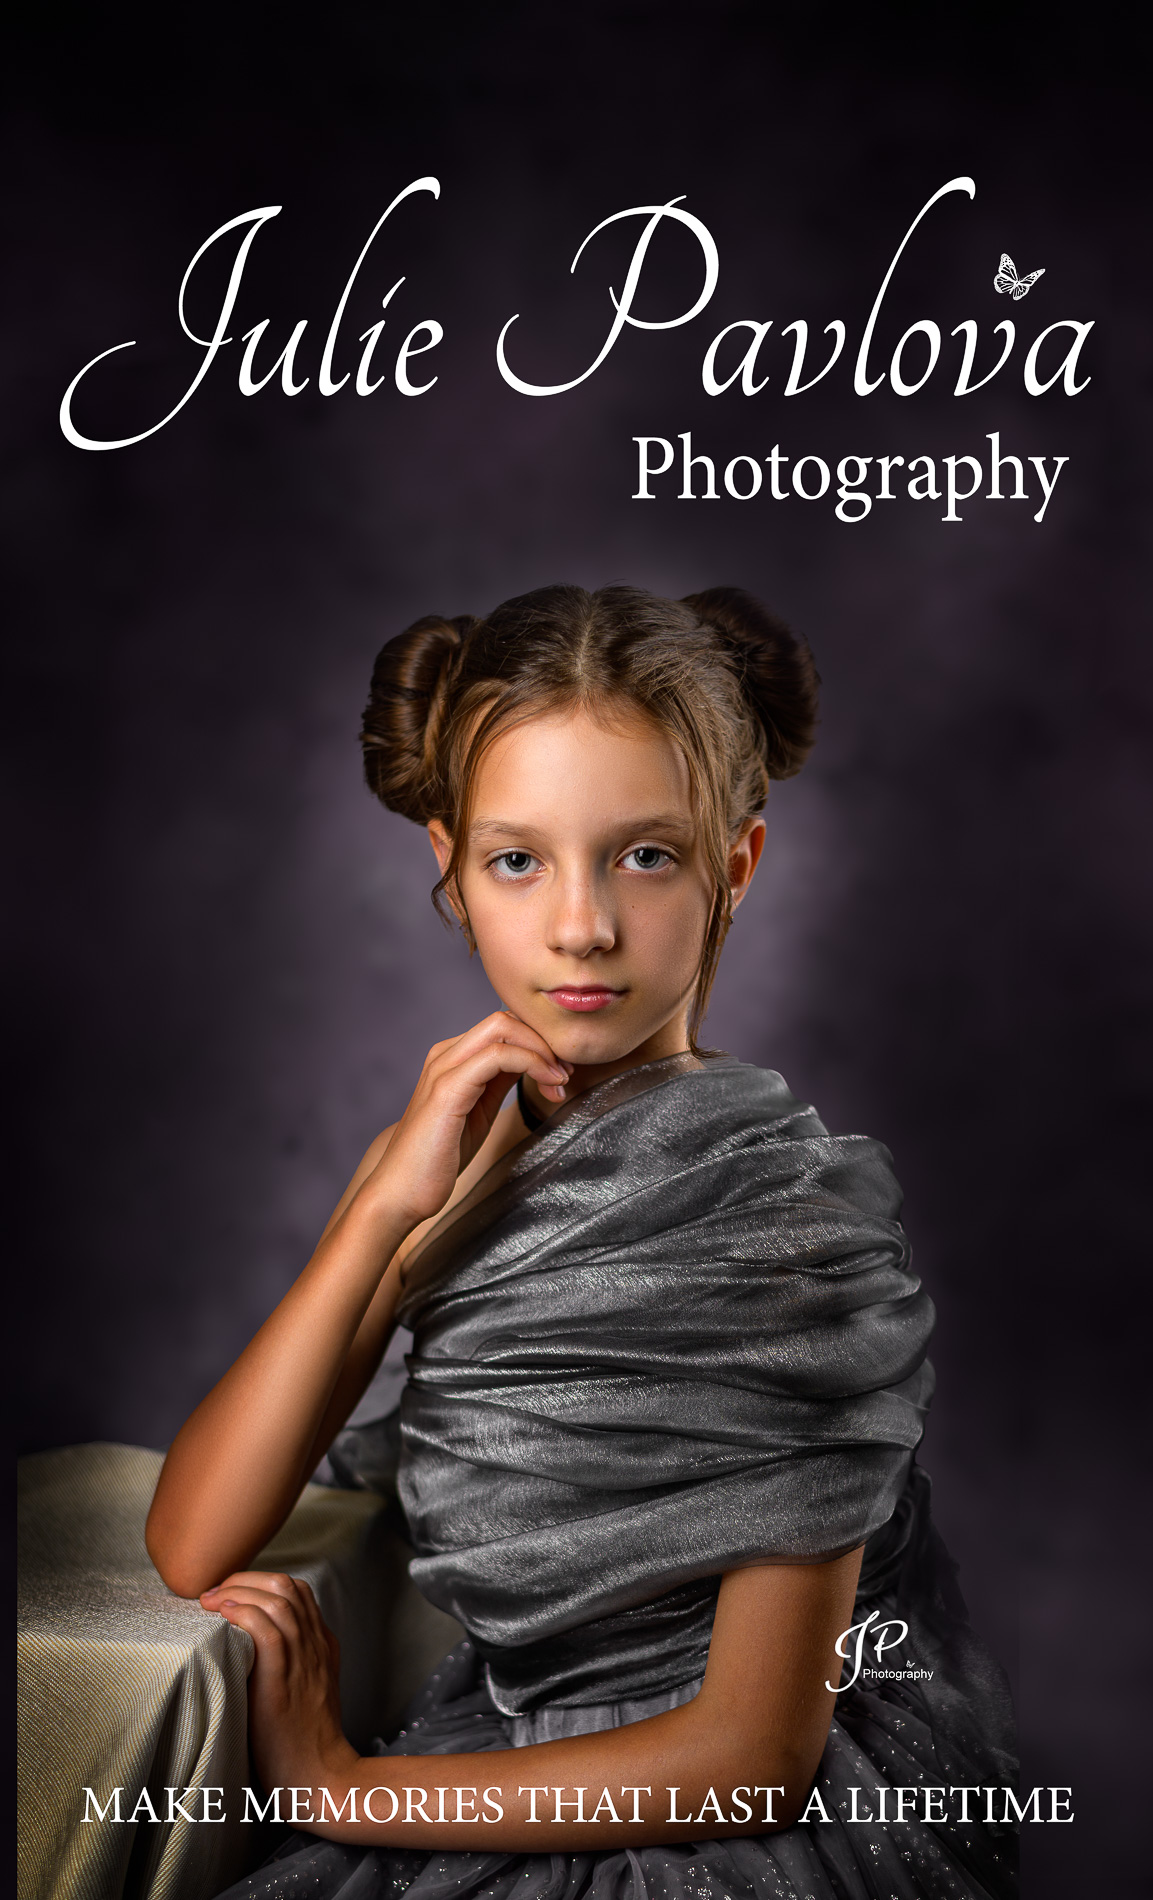 Fine Art Children Portrait by New Jersey professional photographer Julie Pavlova Photography, top 20 Best New York Photographers (Bergen County, NJ)